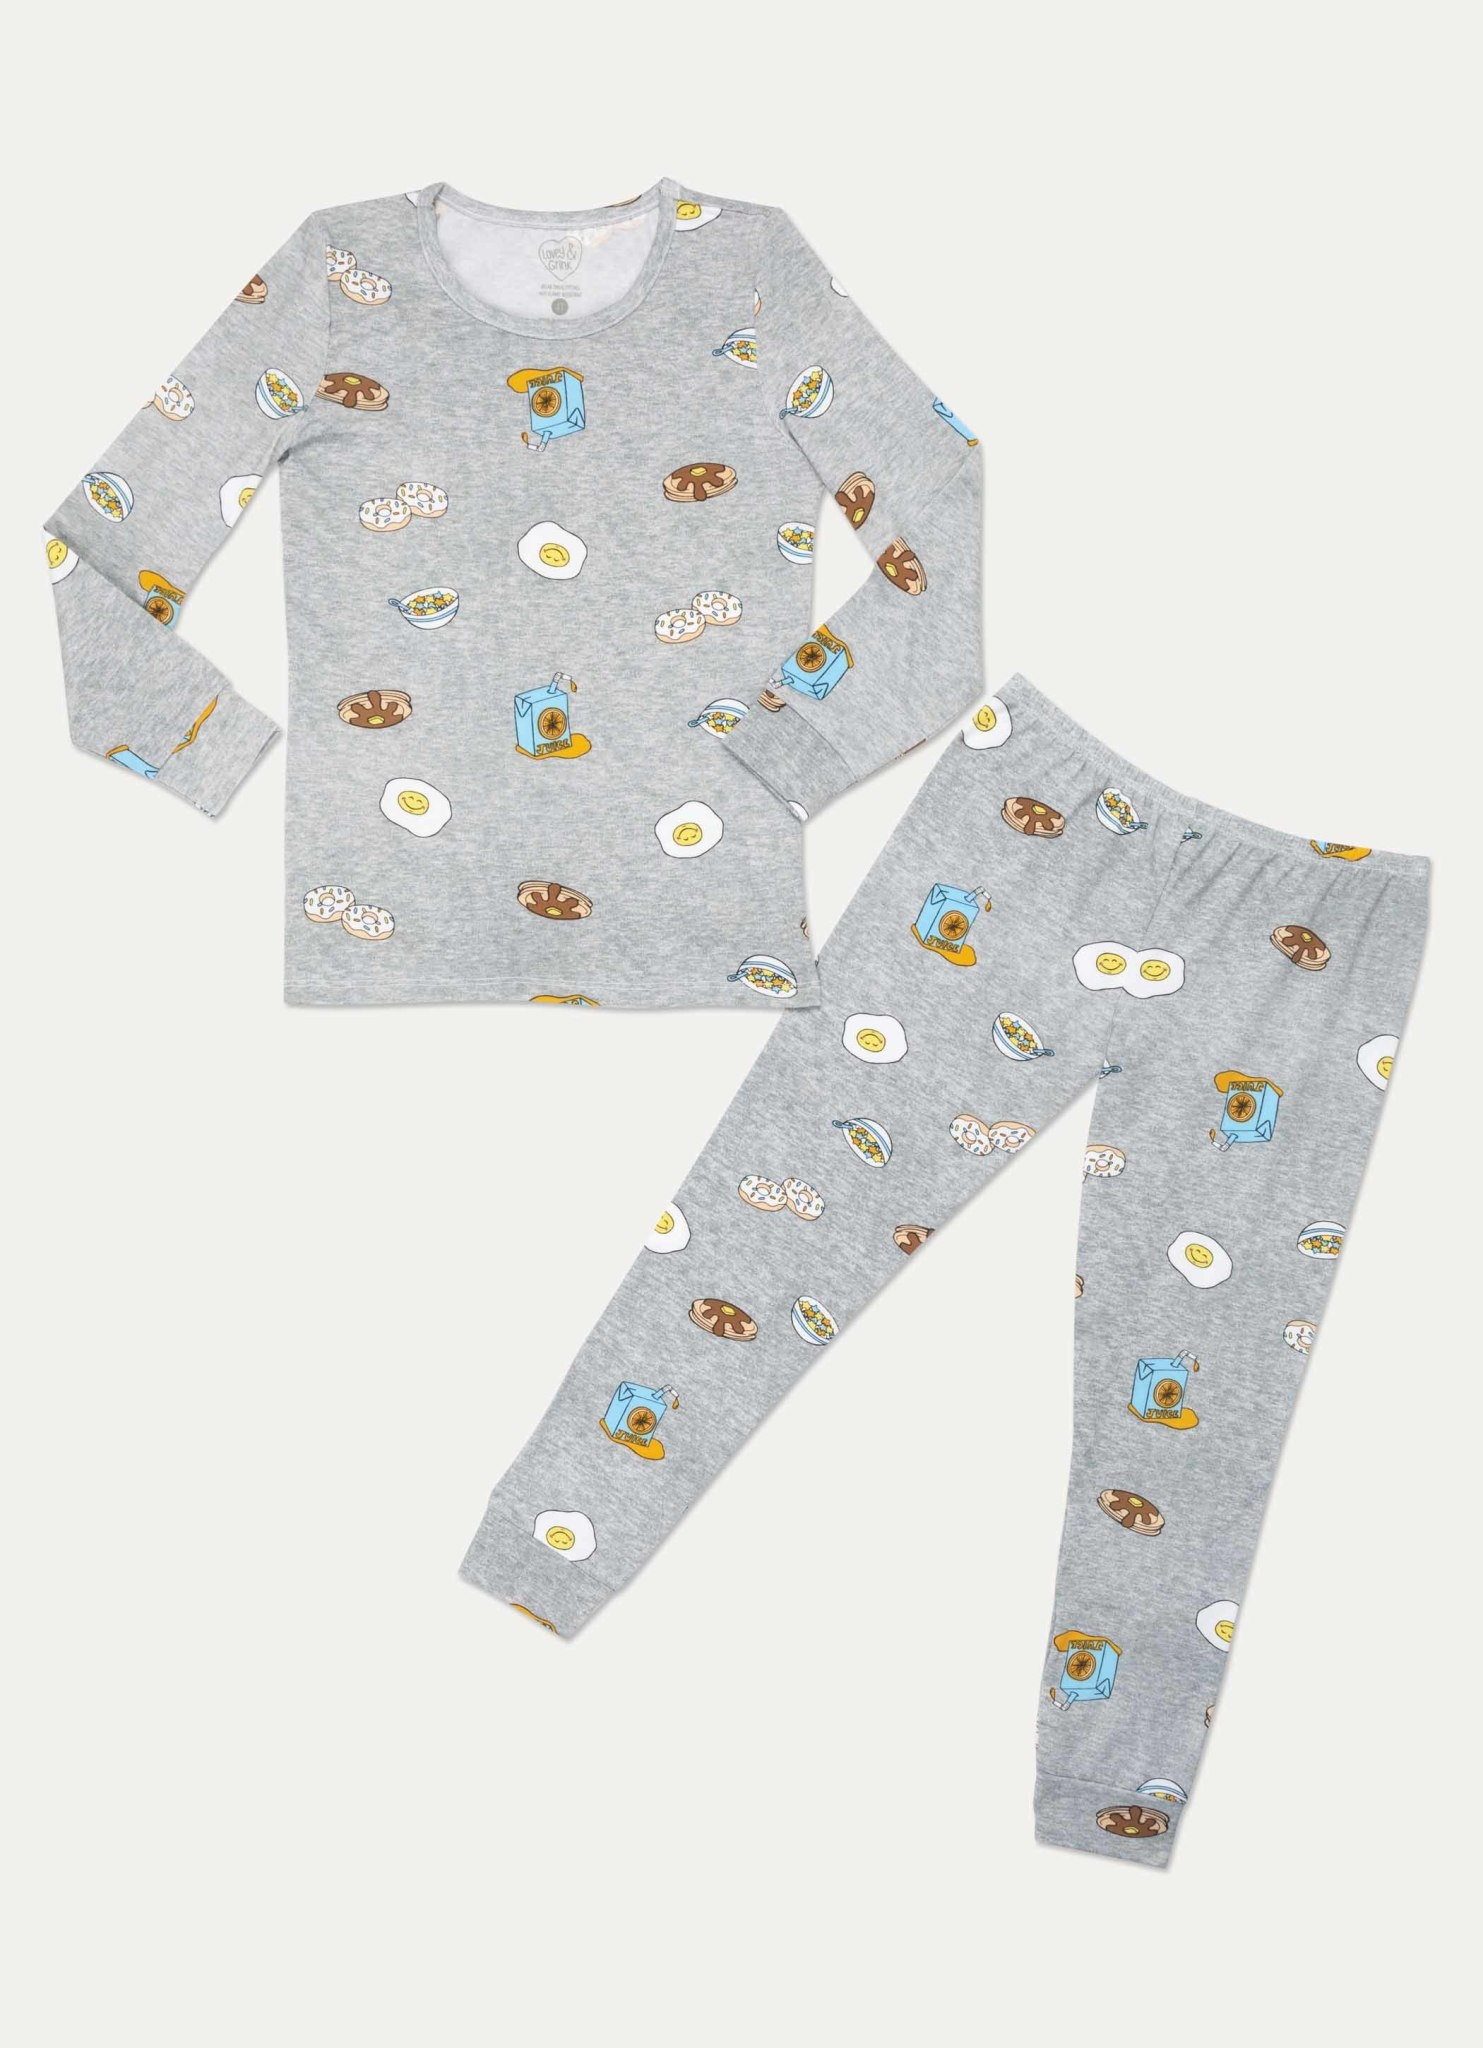 LOVEY & GRINK Pajamas